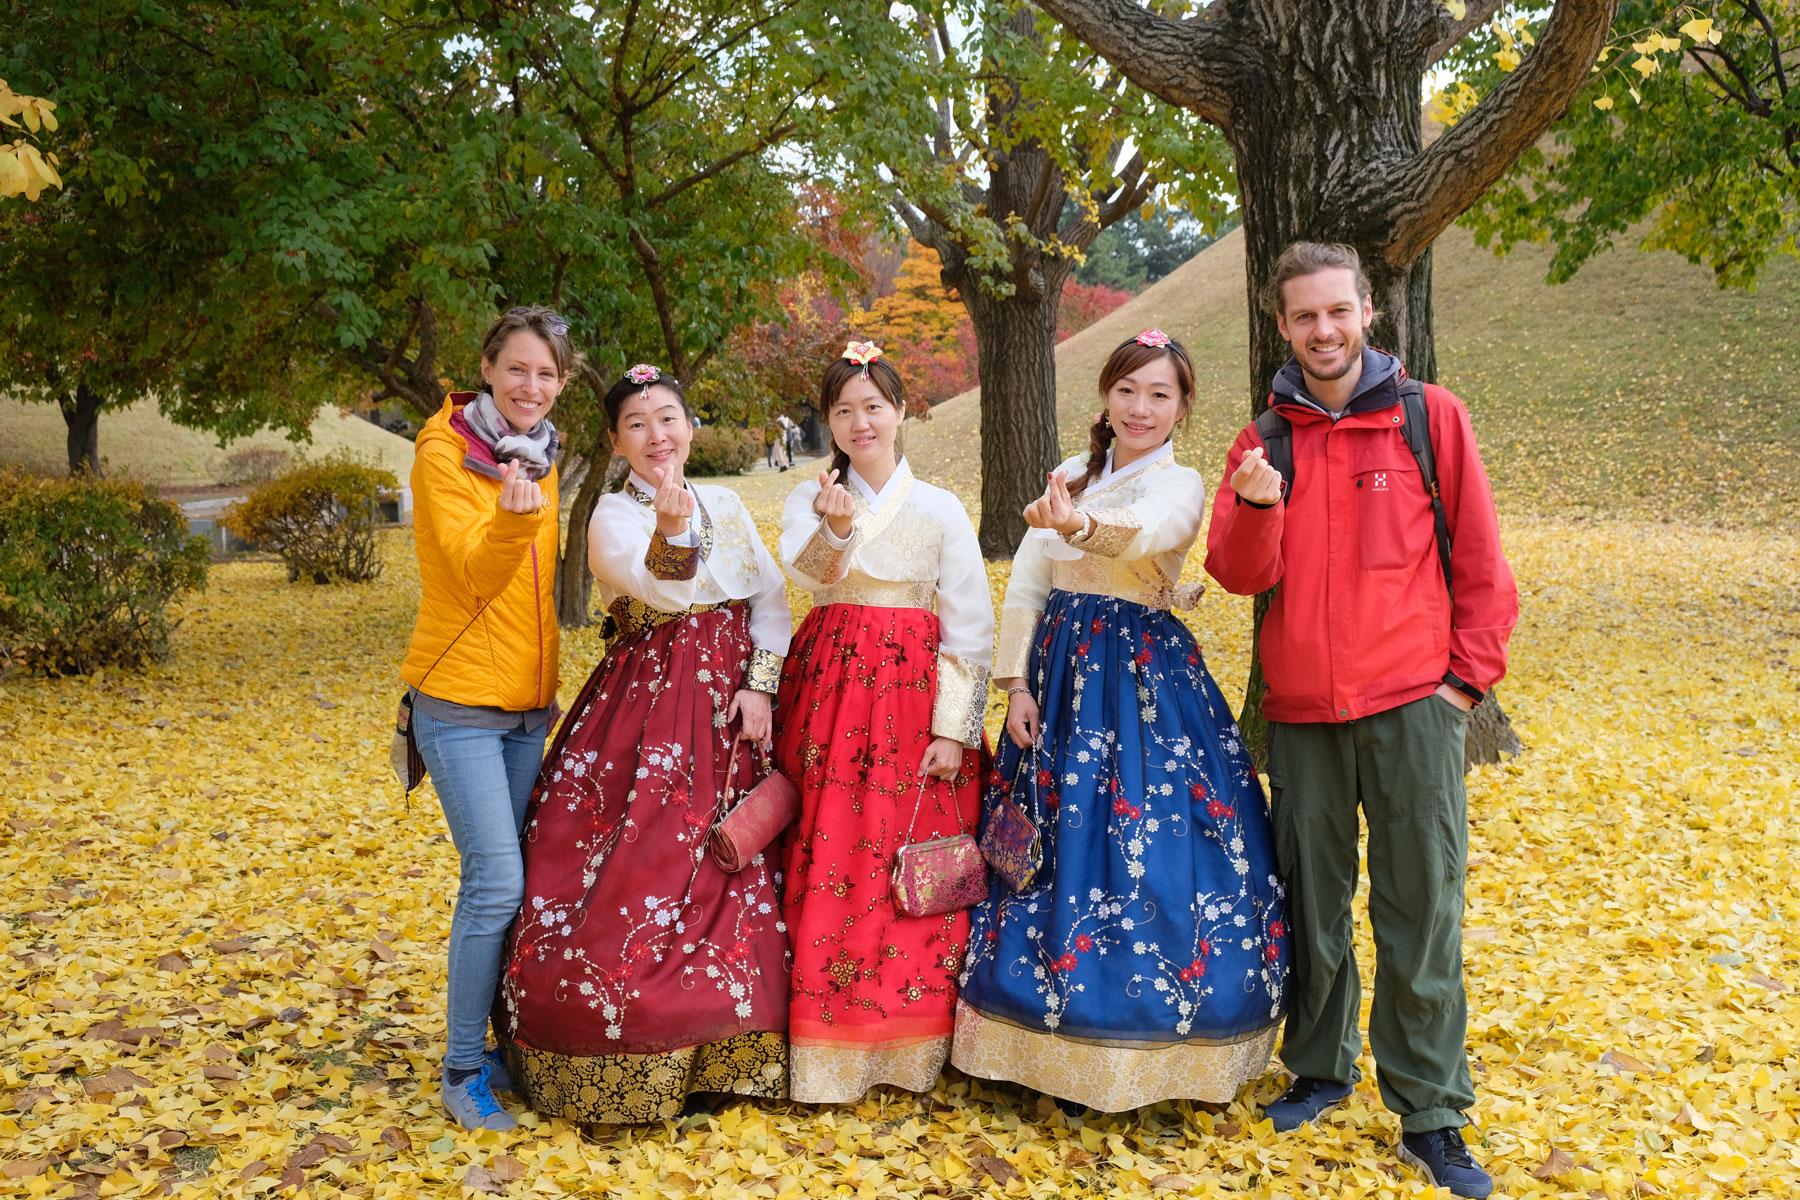 Leo und Sebastian mit drei Taiwanesinnen in Gyeongju in Südkorea.